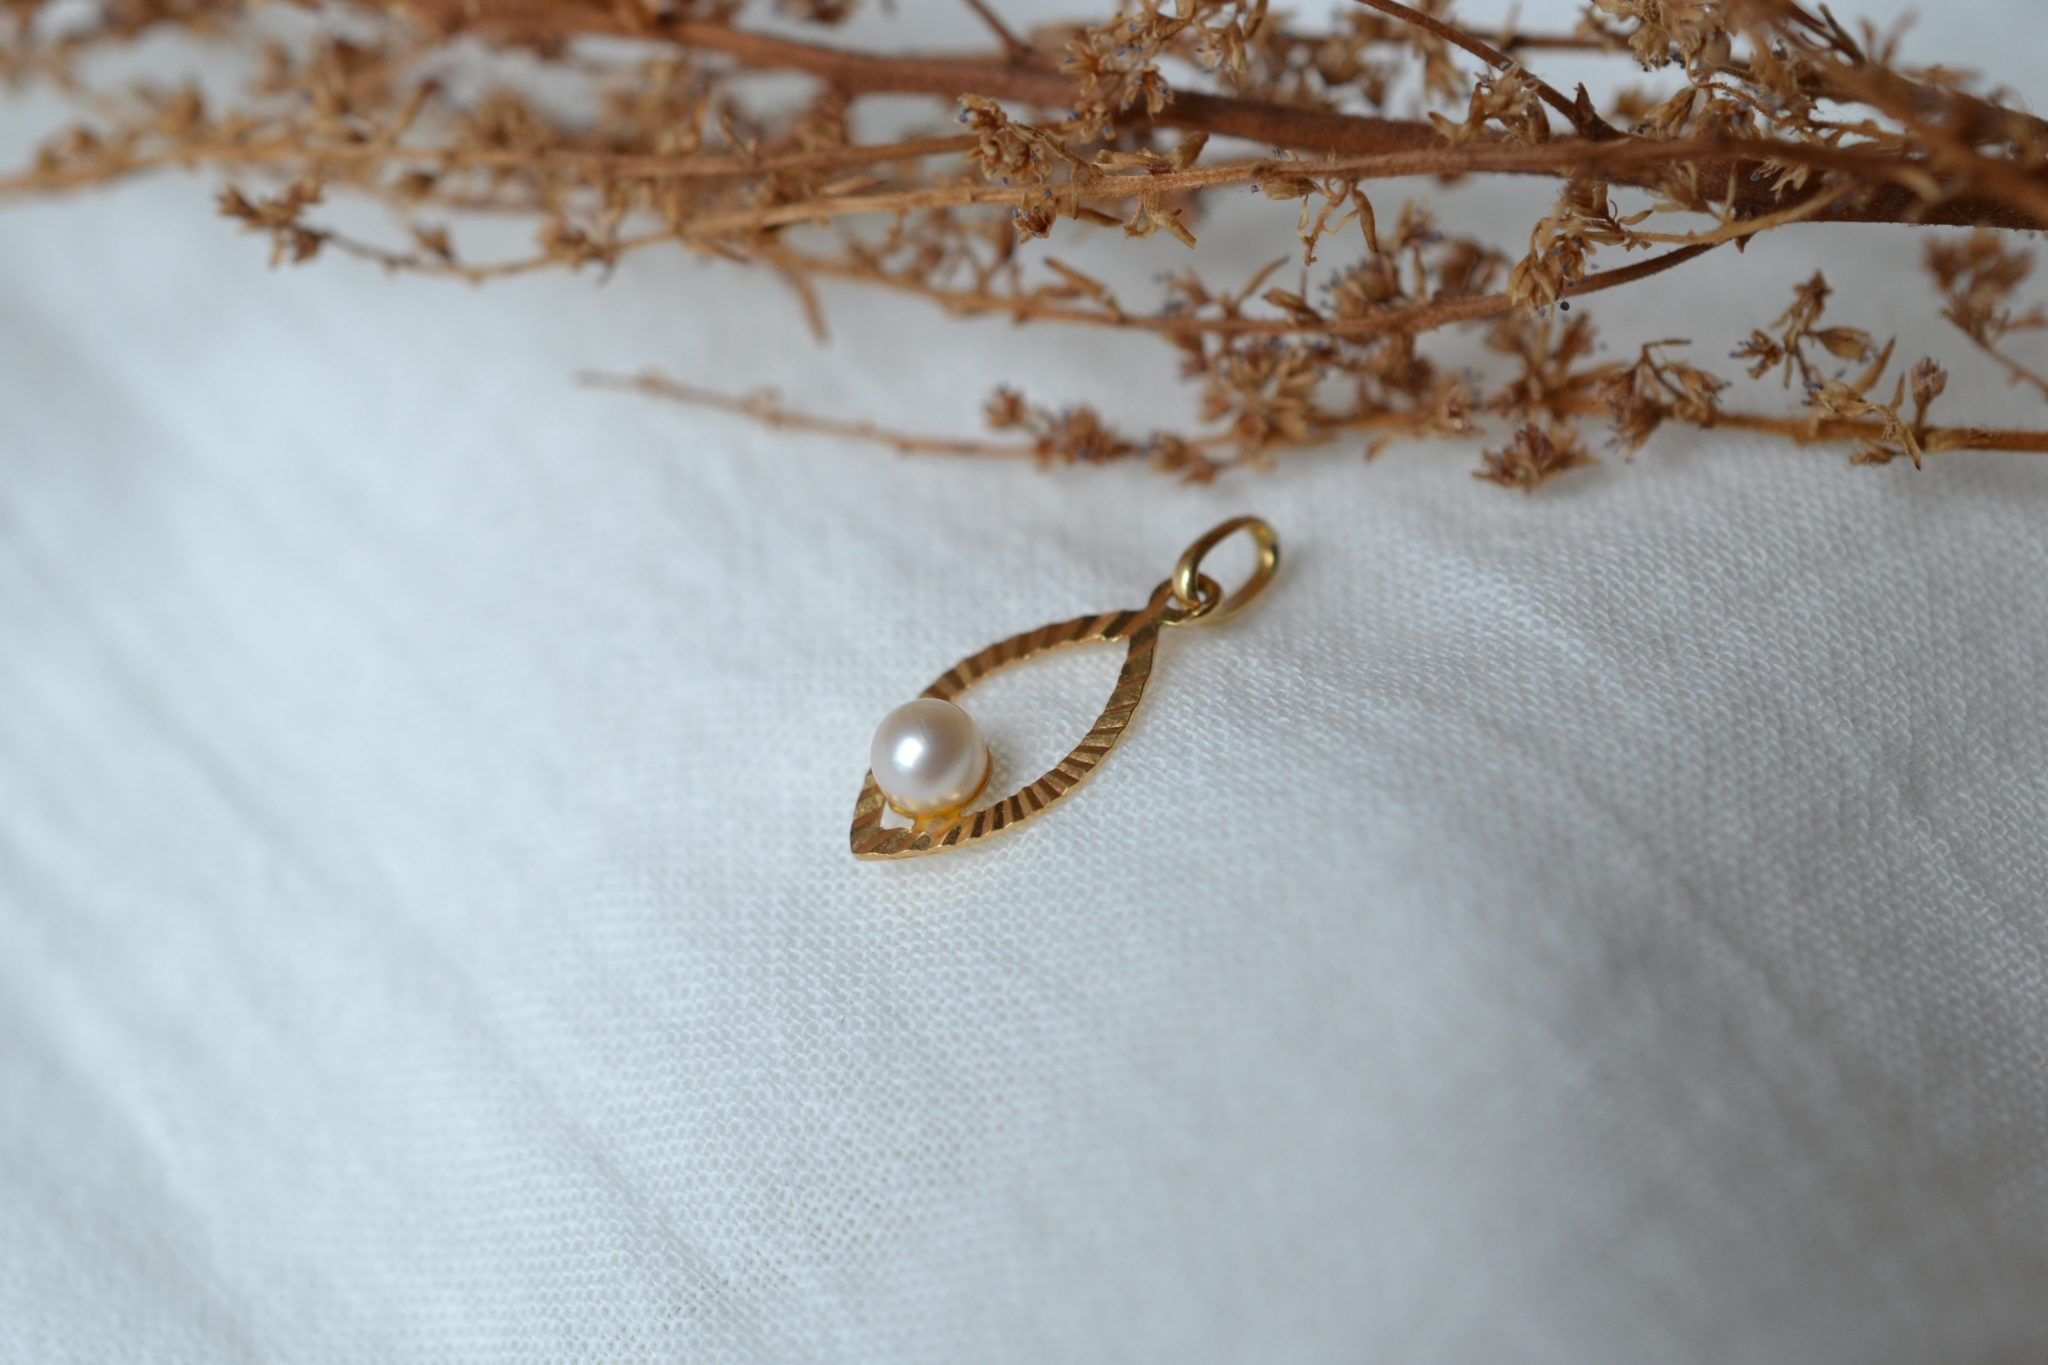 Pendentif ajouré en Or jaune en forme de goutte, serti d_une perlePendentif ajouré en Or jaune en forme de goutte, serti d_une perle - Bijou Vintage